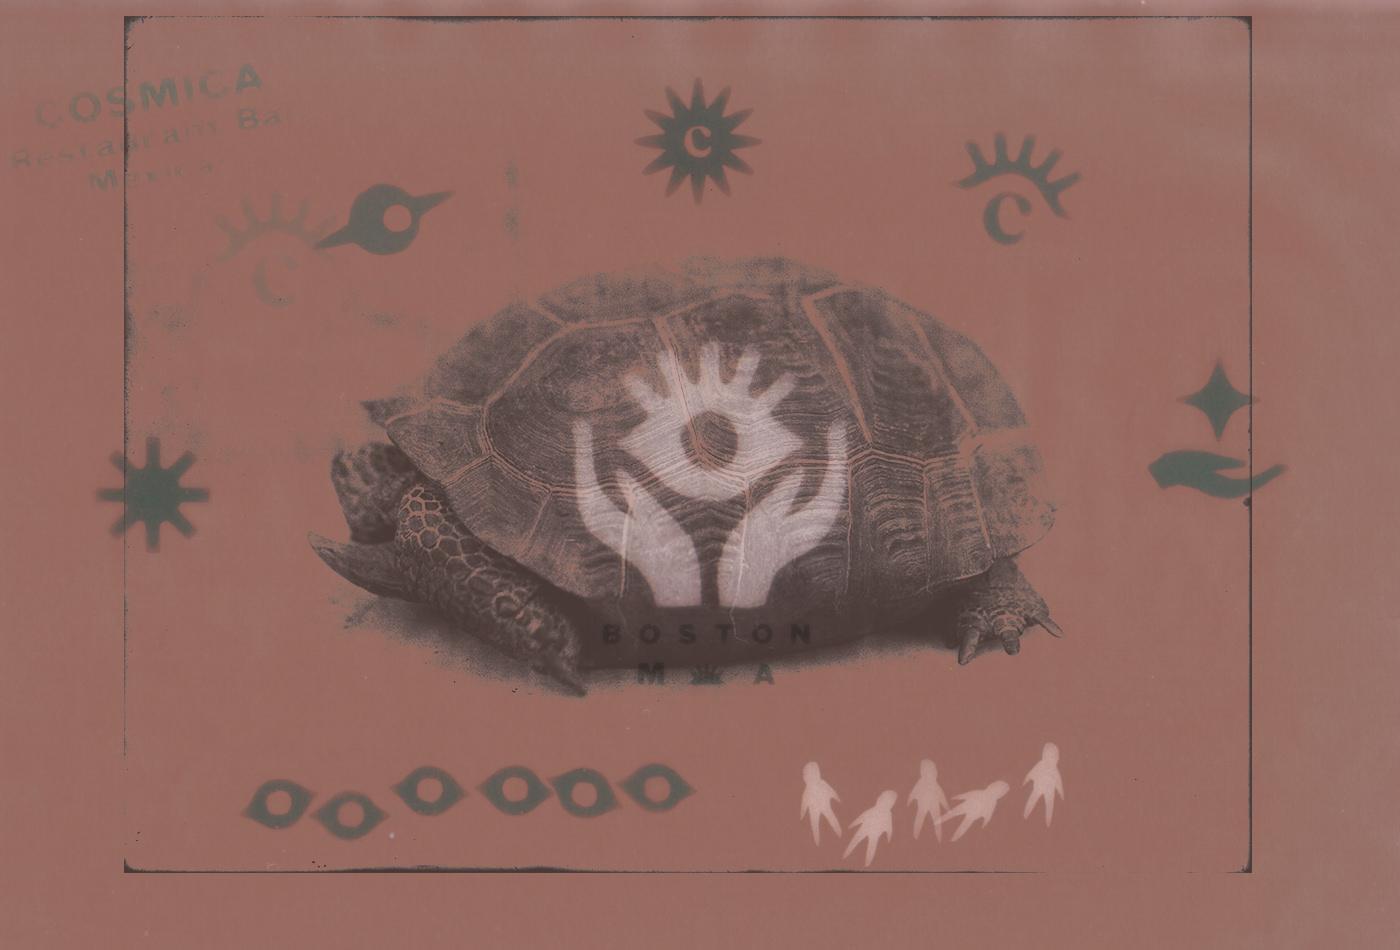 cosmica-cosmicaboston-boston-brewhall-thebeehive-jackbardy-vacaliebres-branding-mexican-mexico-taco-tacos-cla-mex-logo-eye-cosmiceye-god-beams